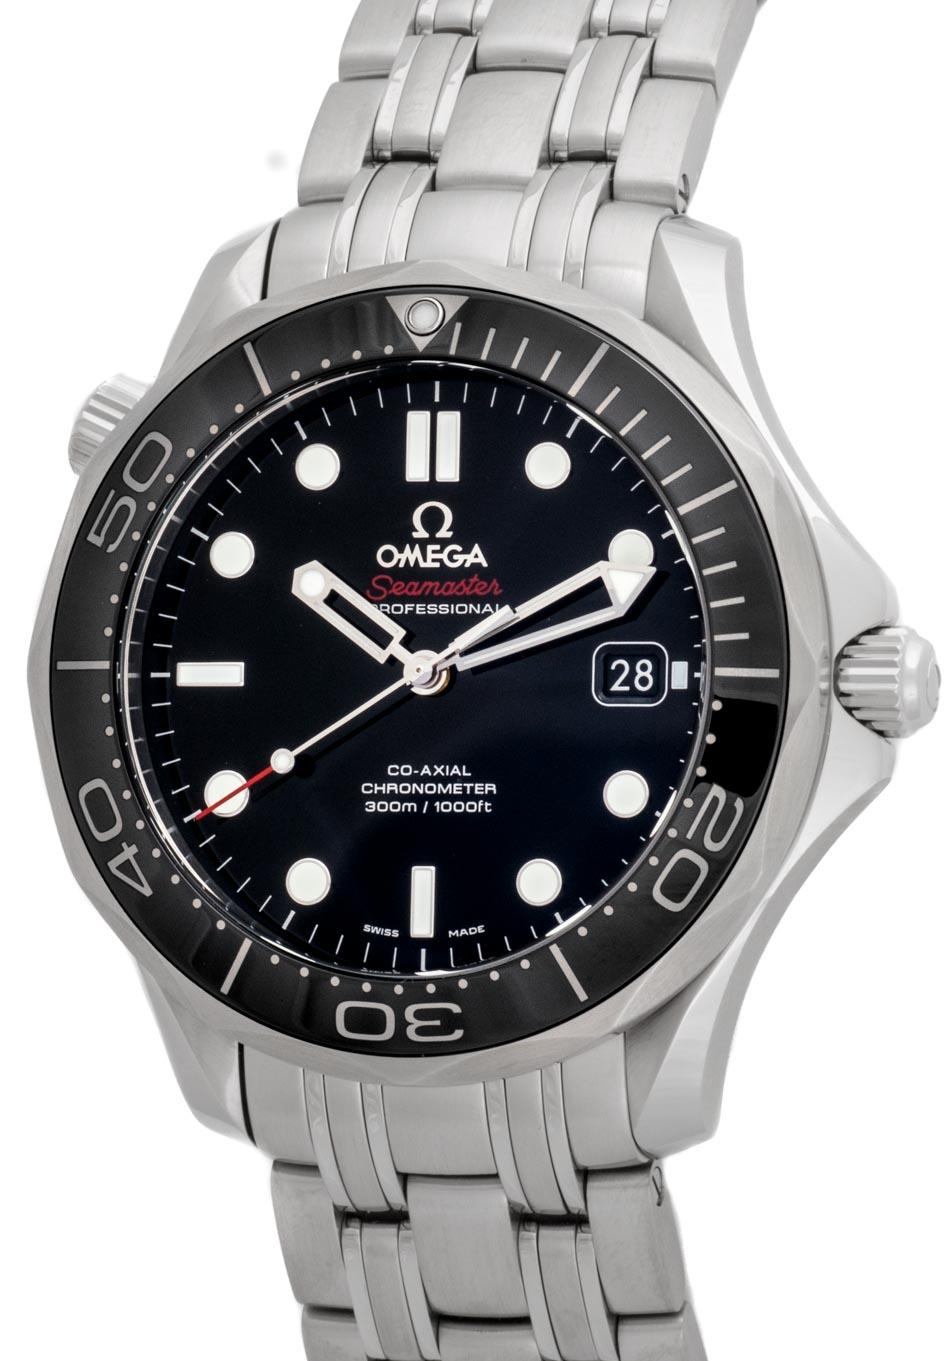 Omega seamaster diver 300m - Omega dive watch ...